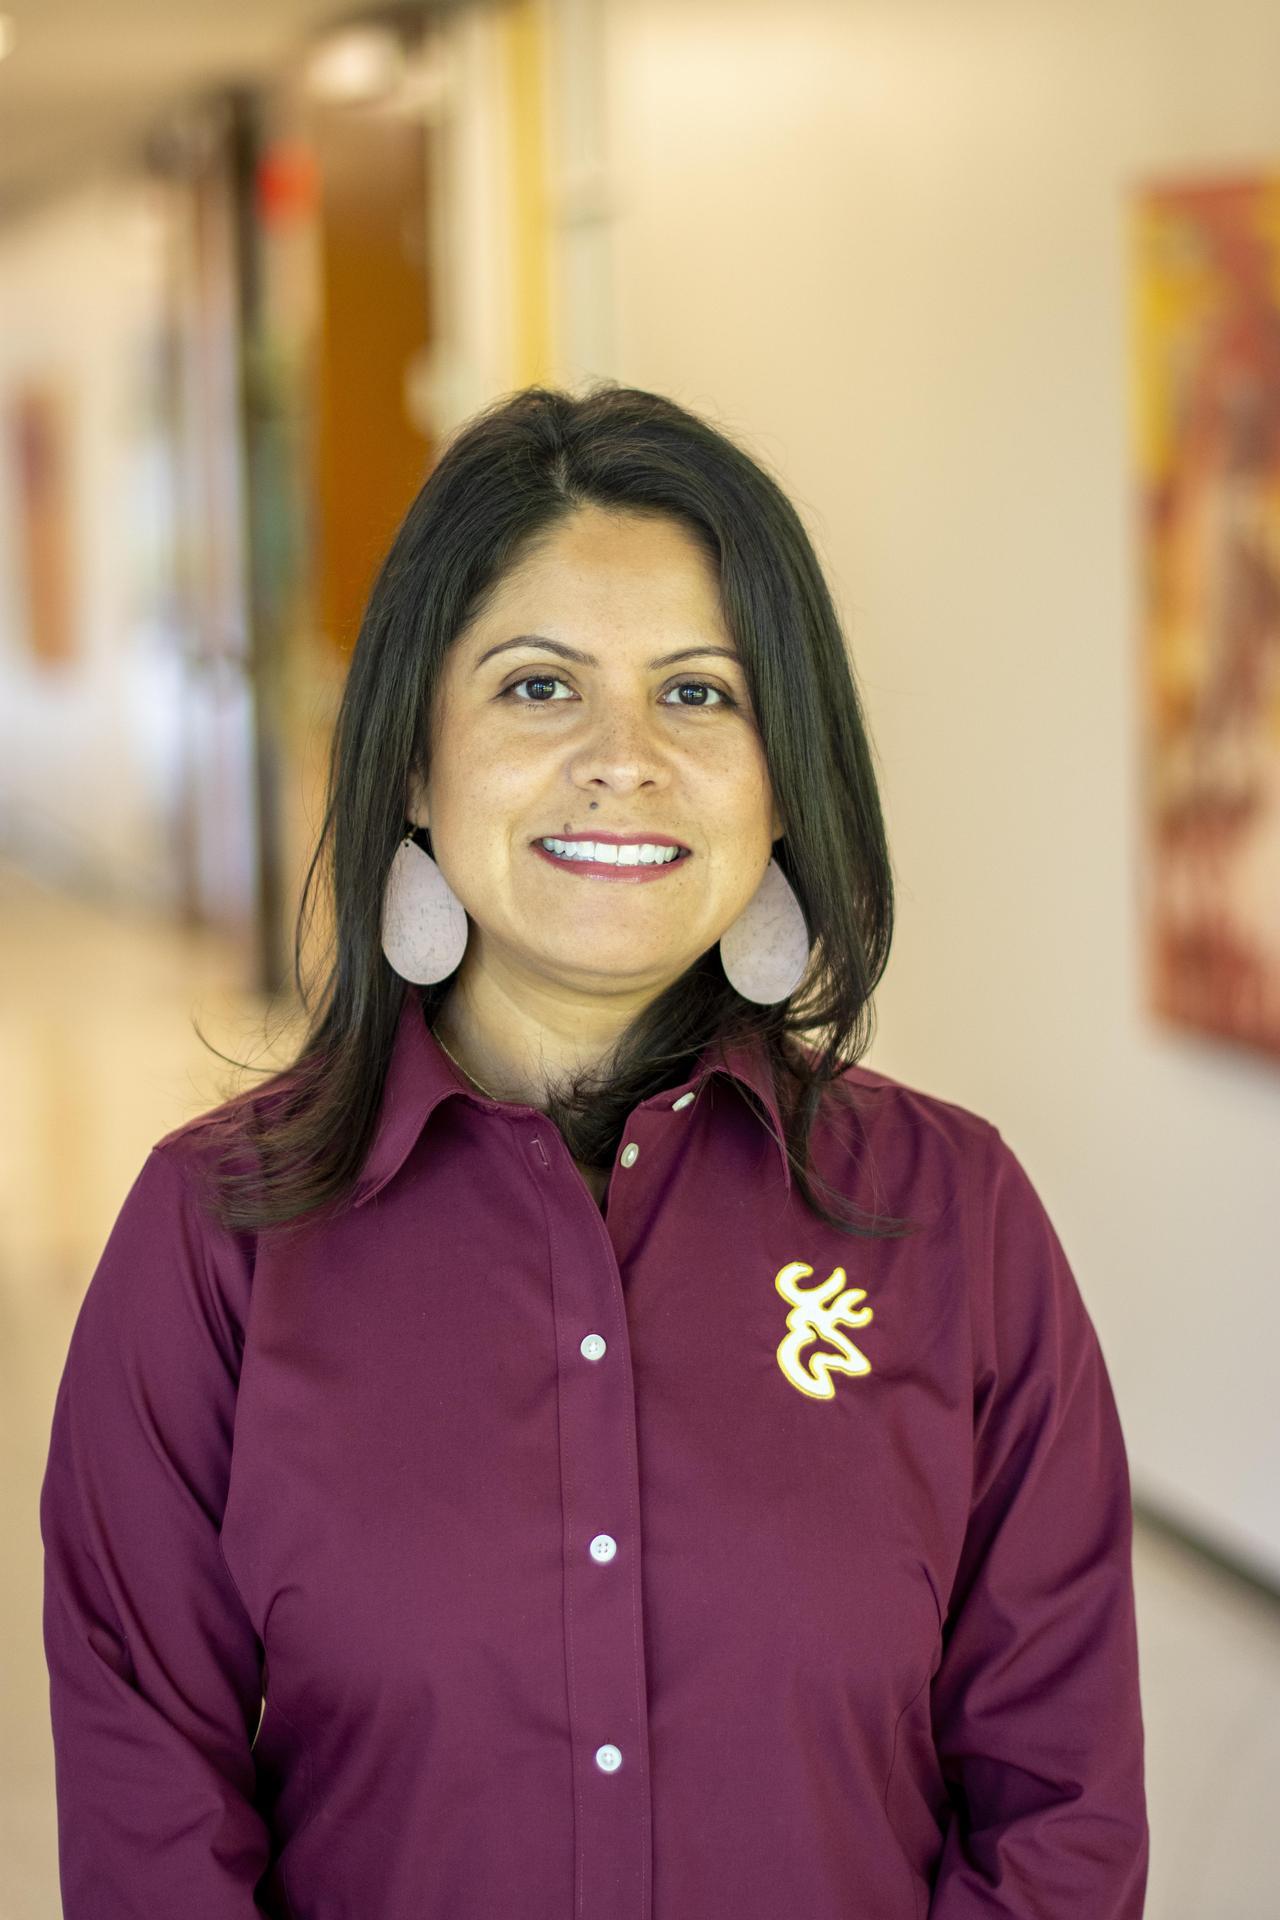 Head shot photo of Deer Park Elementary Assistant Principal Janet Cavazos